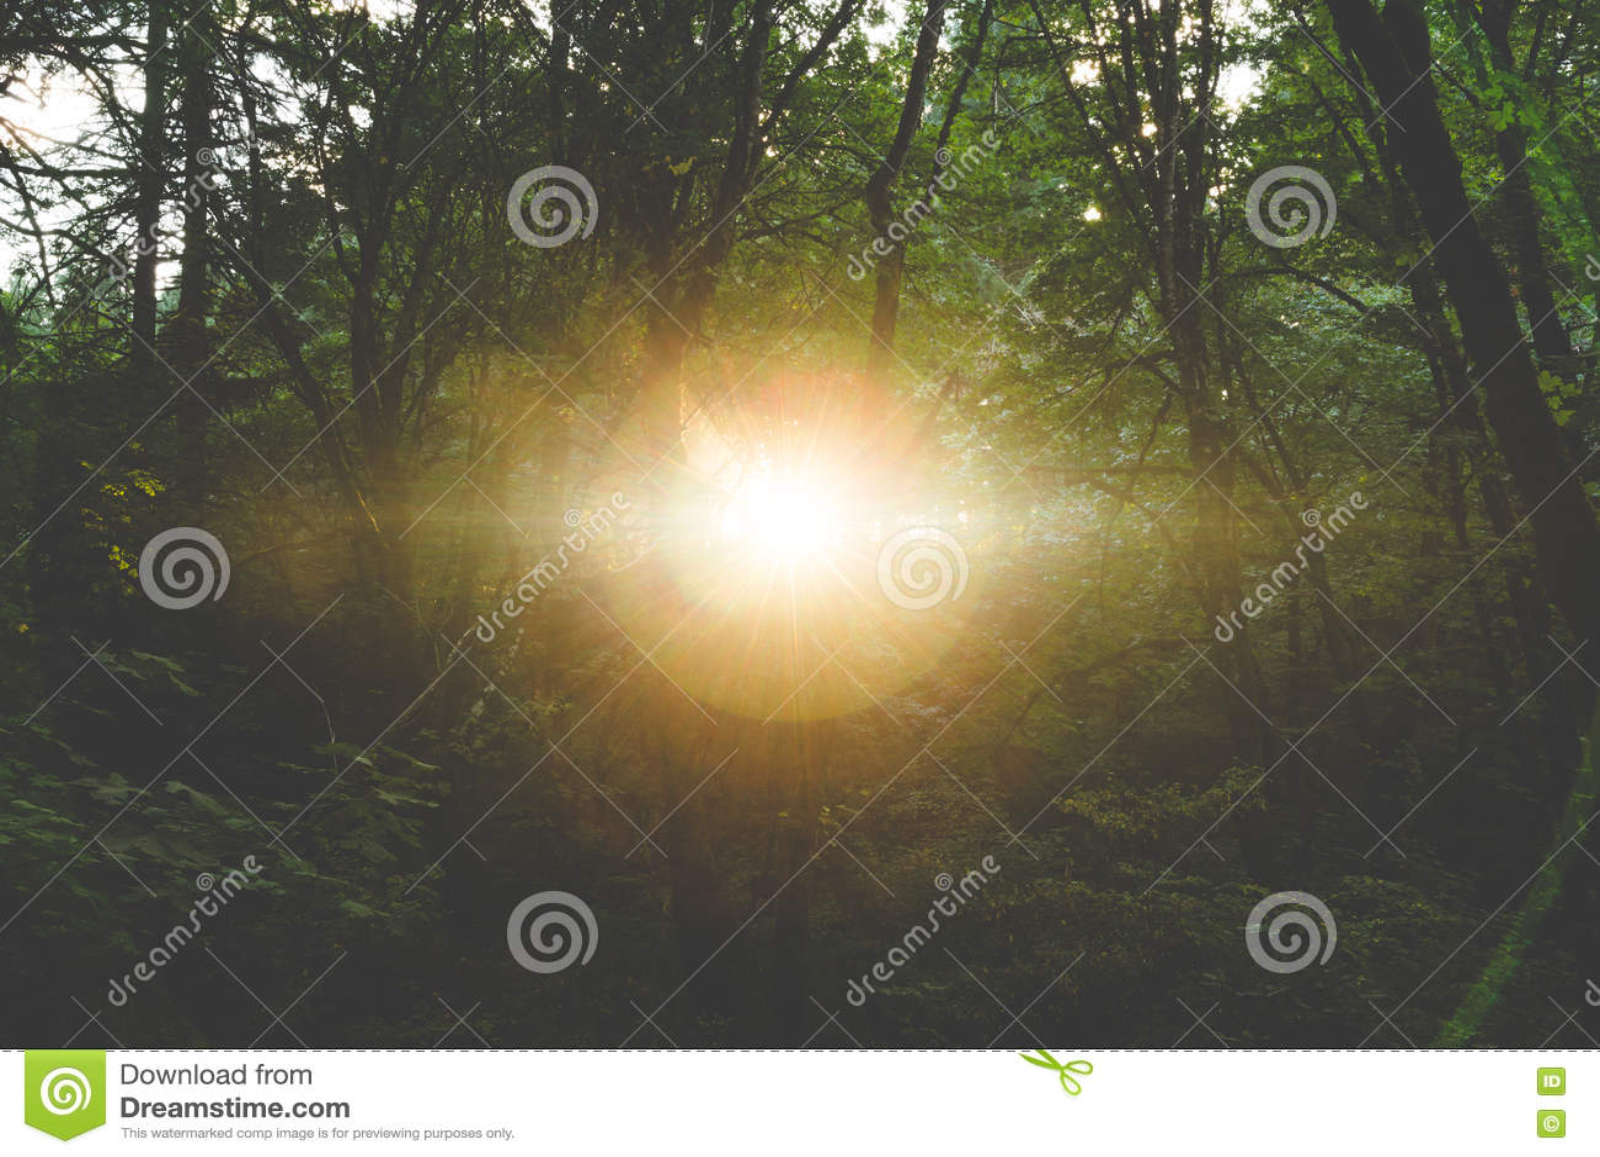 Sun shining through the dark forest